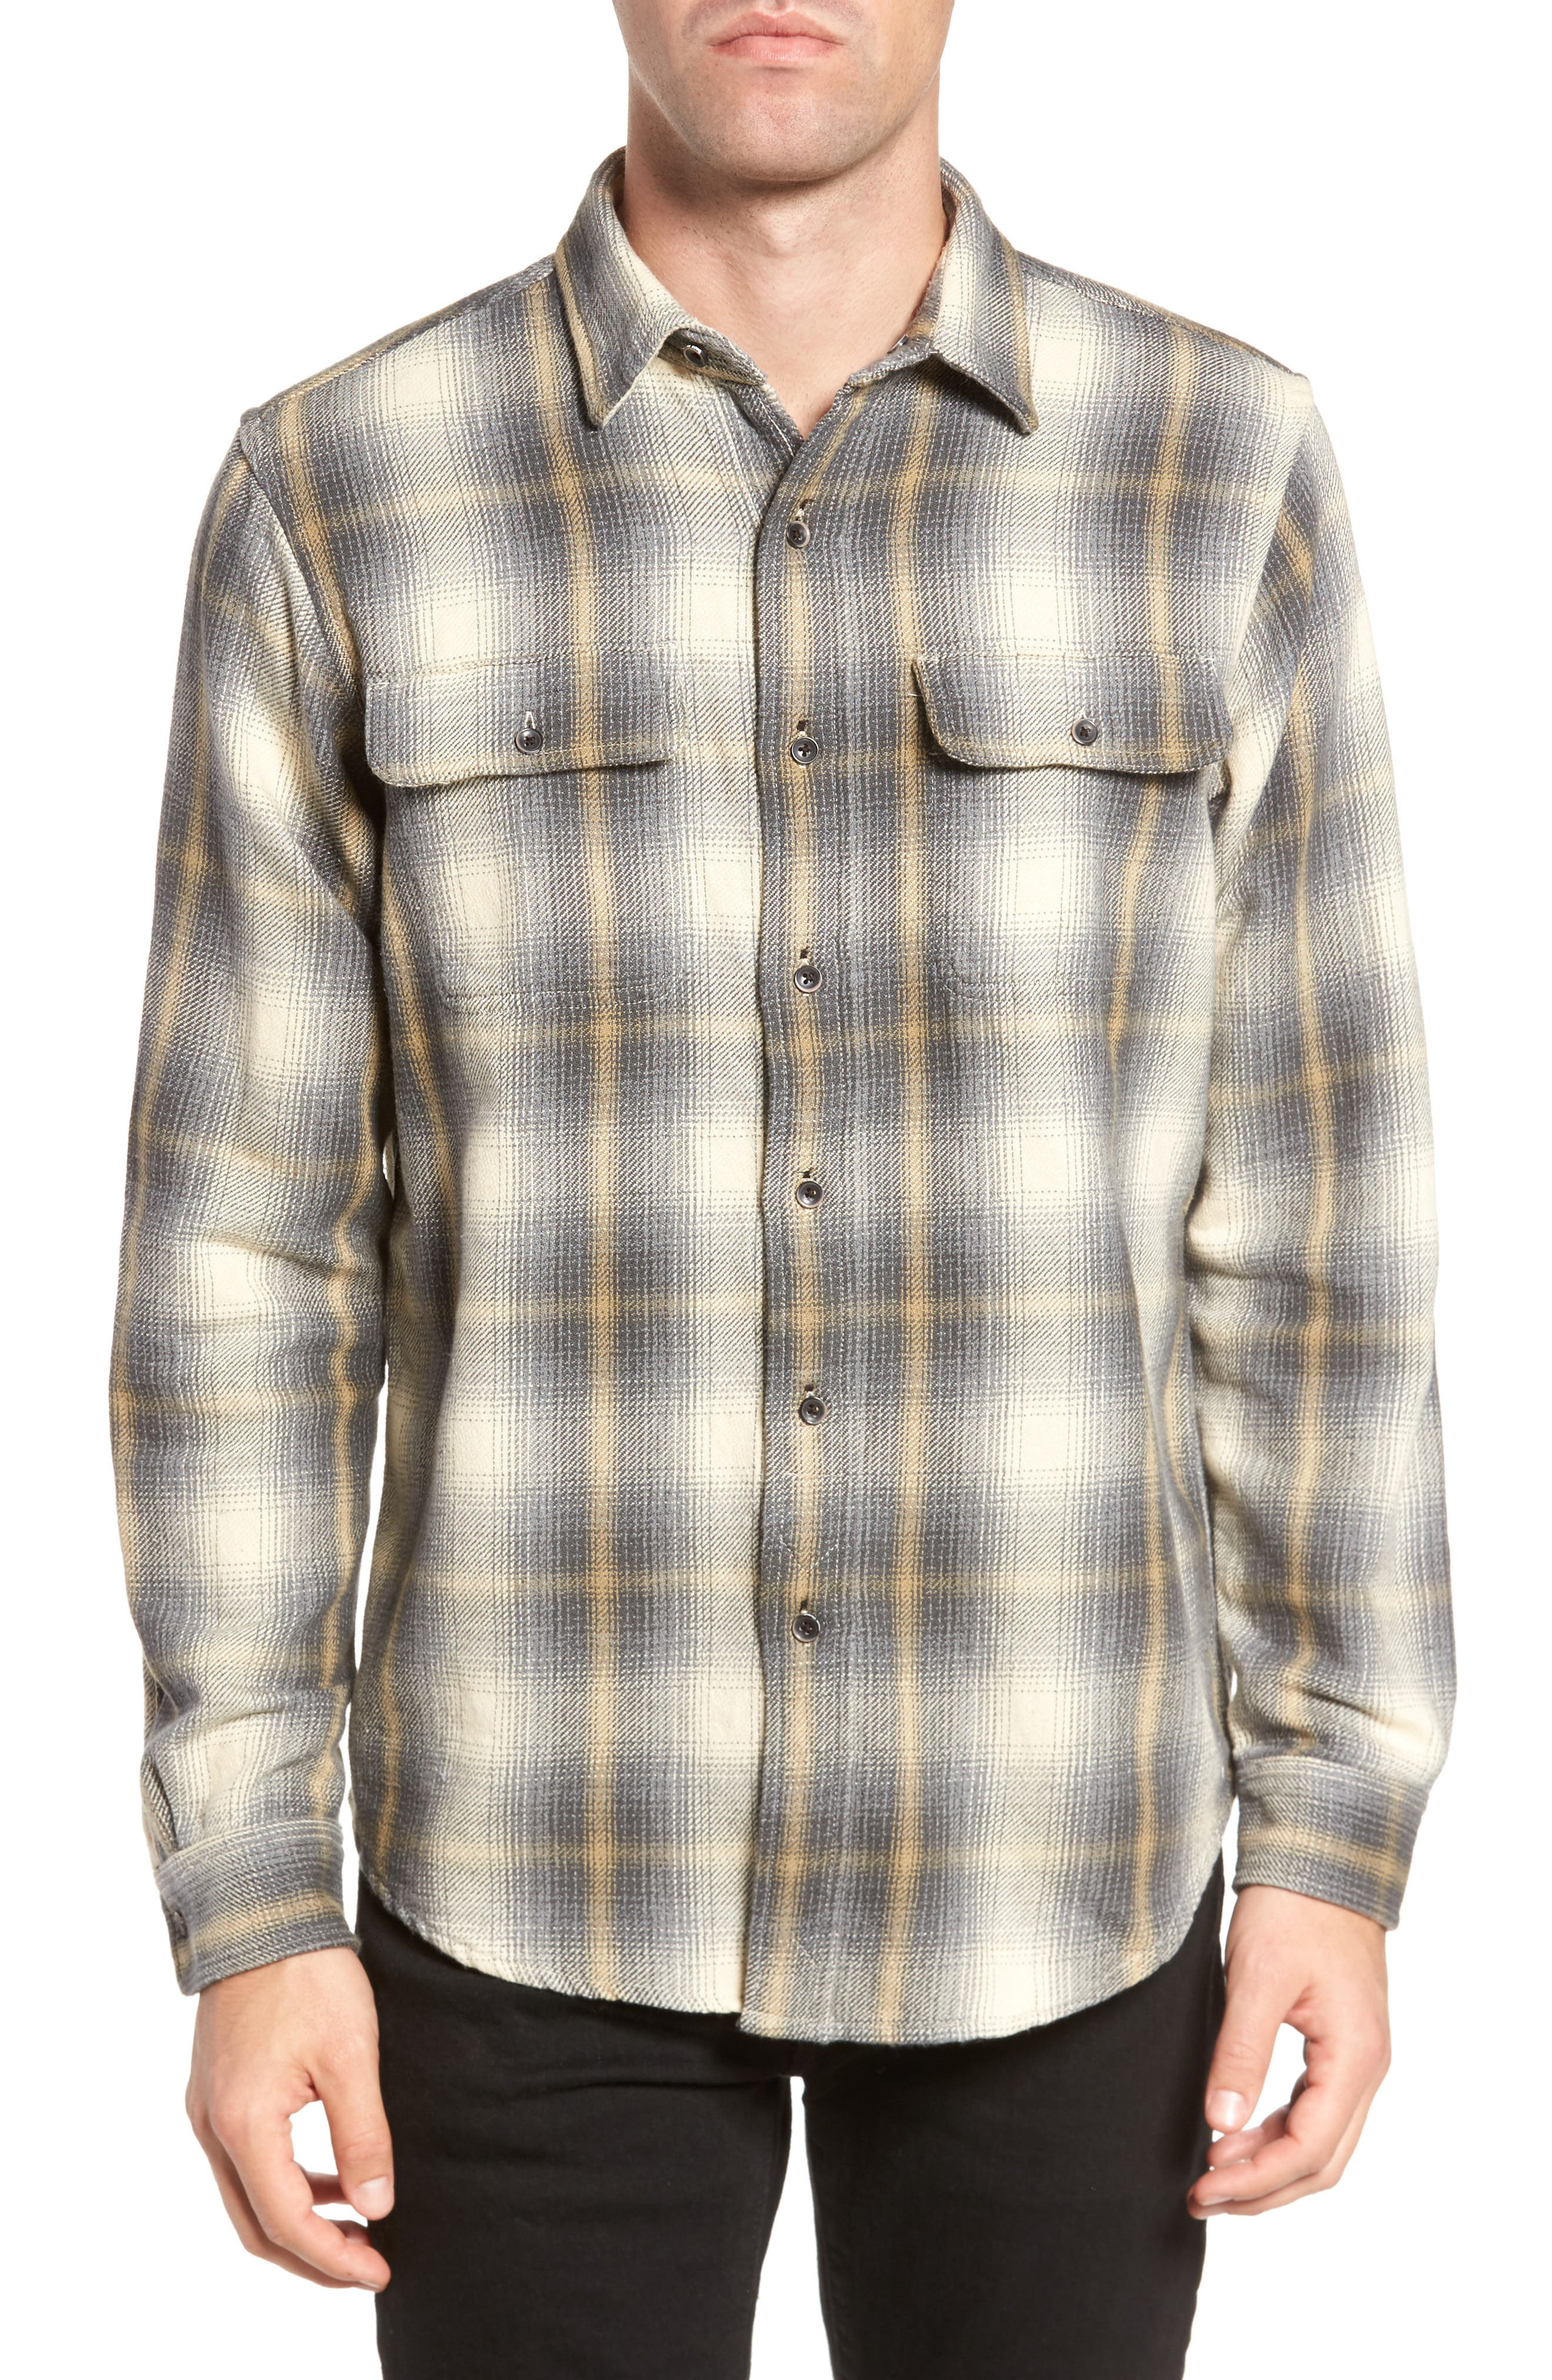 Tailor Vintage Heavy Twill Reversible Shirt Jacket